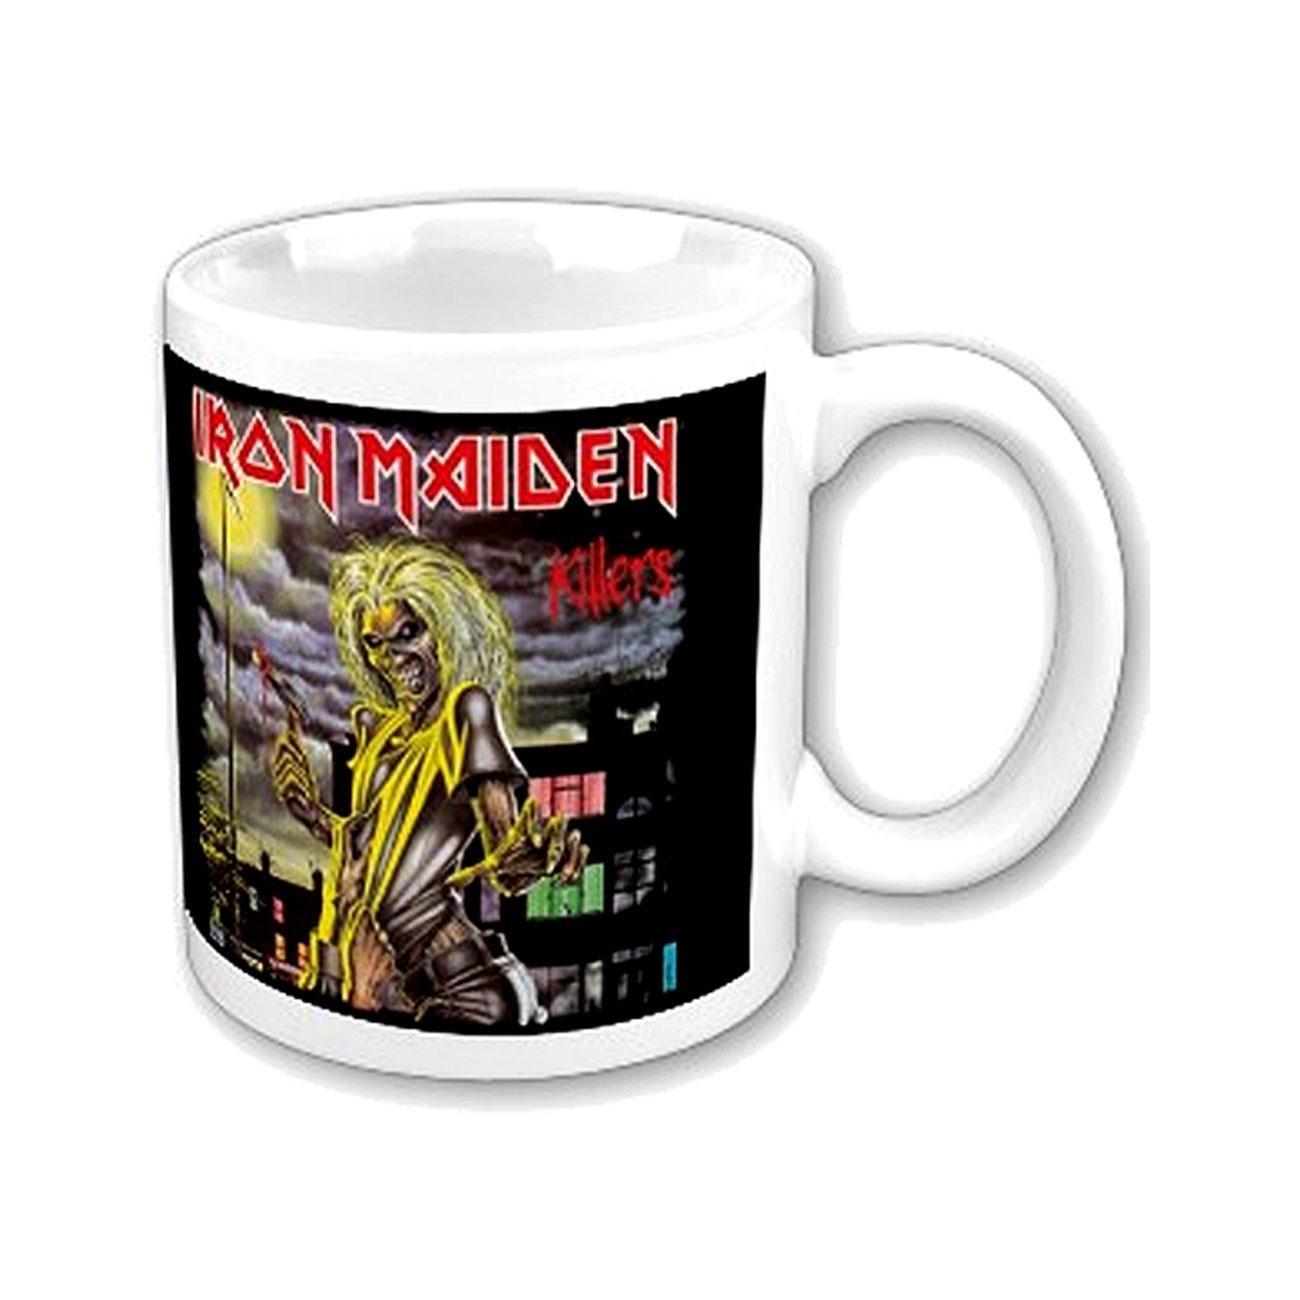 Amazon.com: EMI - Iron Maiden Mug Killers: Home & Kitchen